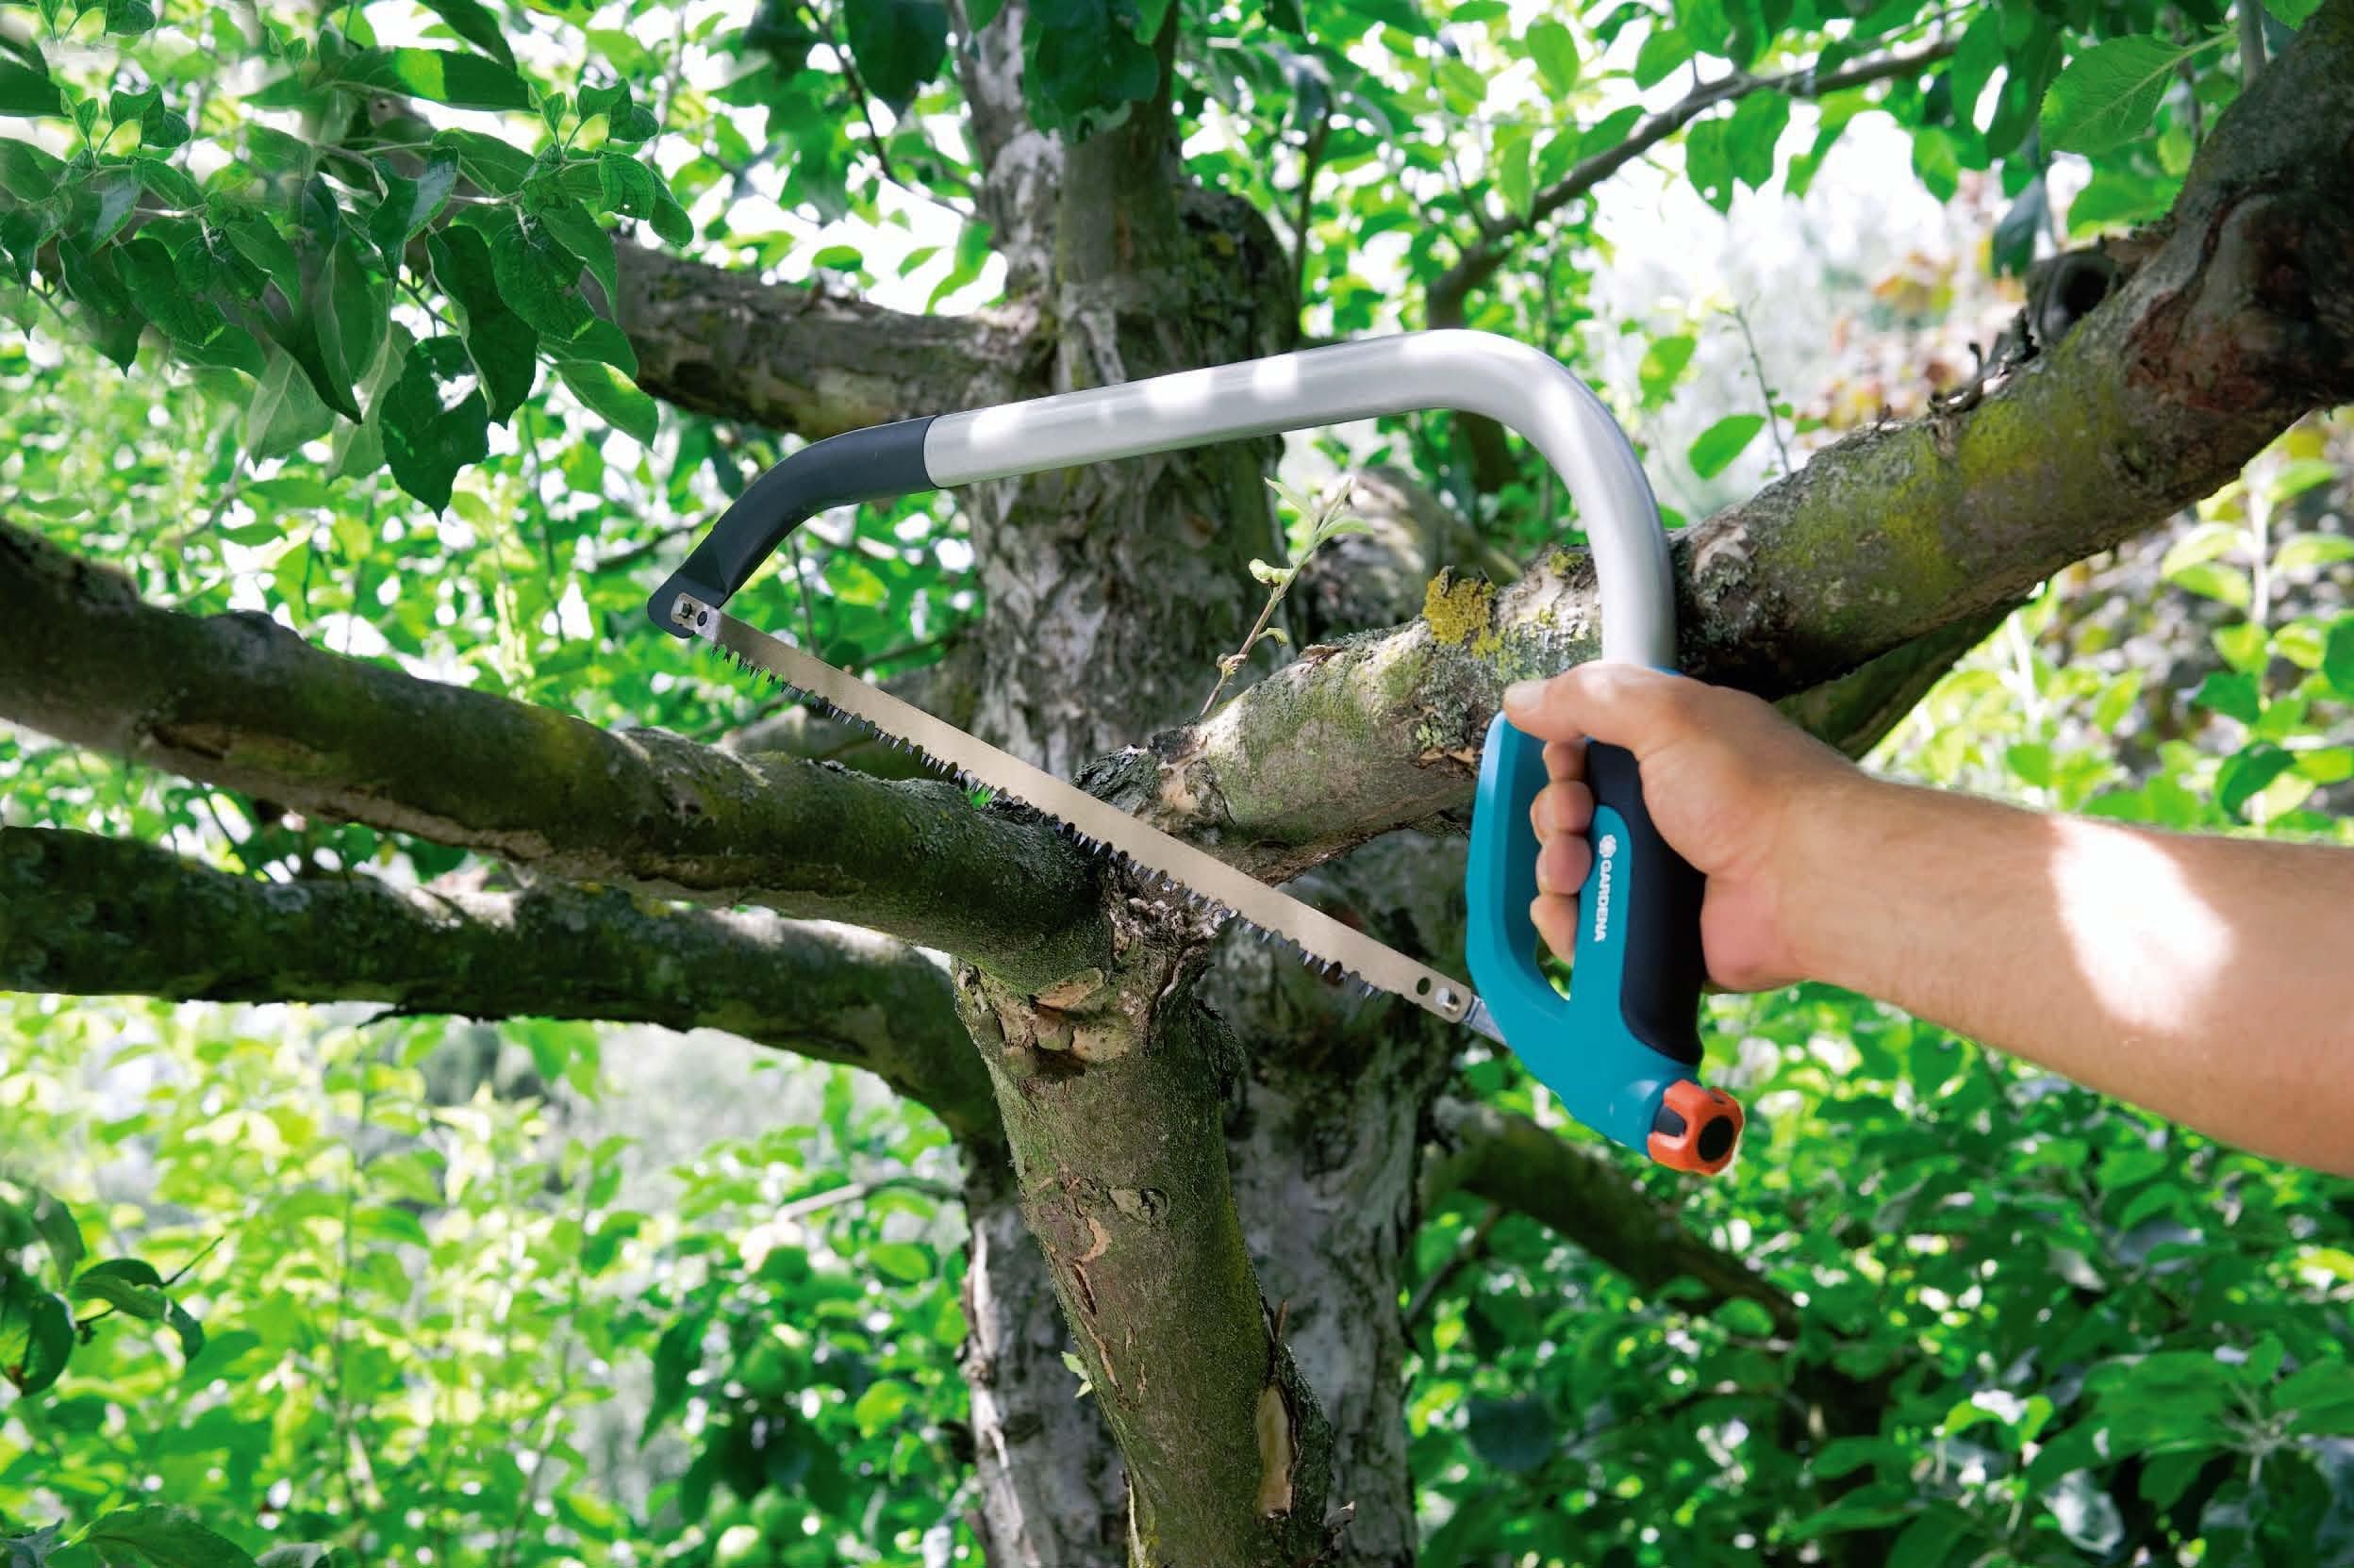 Gardena 8747 Comfort 21-Inch Pruning Bow Saw With Fine Cut Teeth